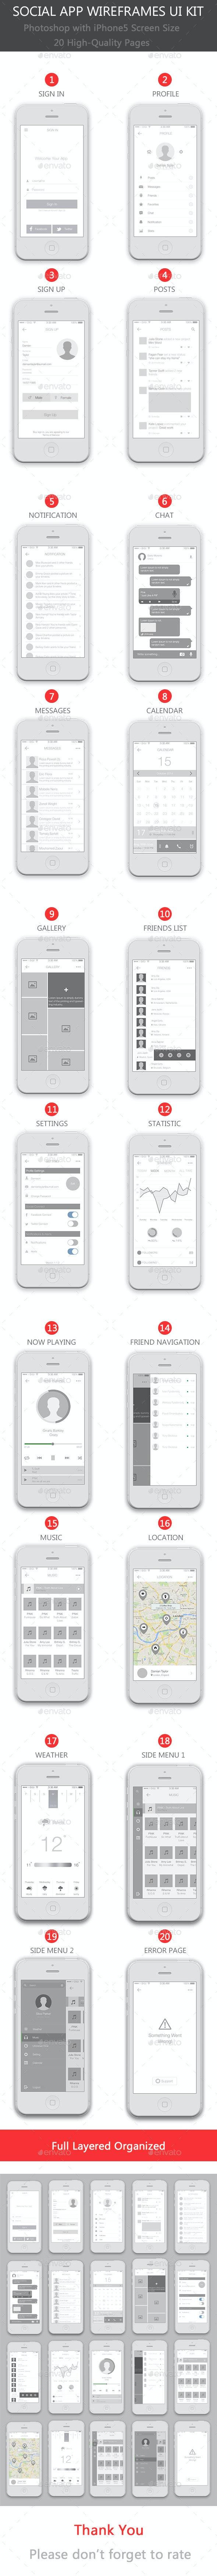 Social App Wireframes UI Kit - User Interfaces Web Elements